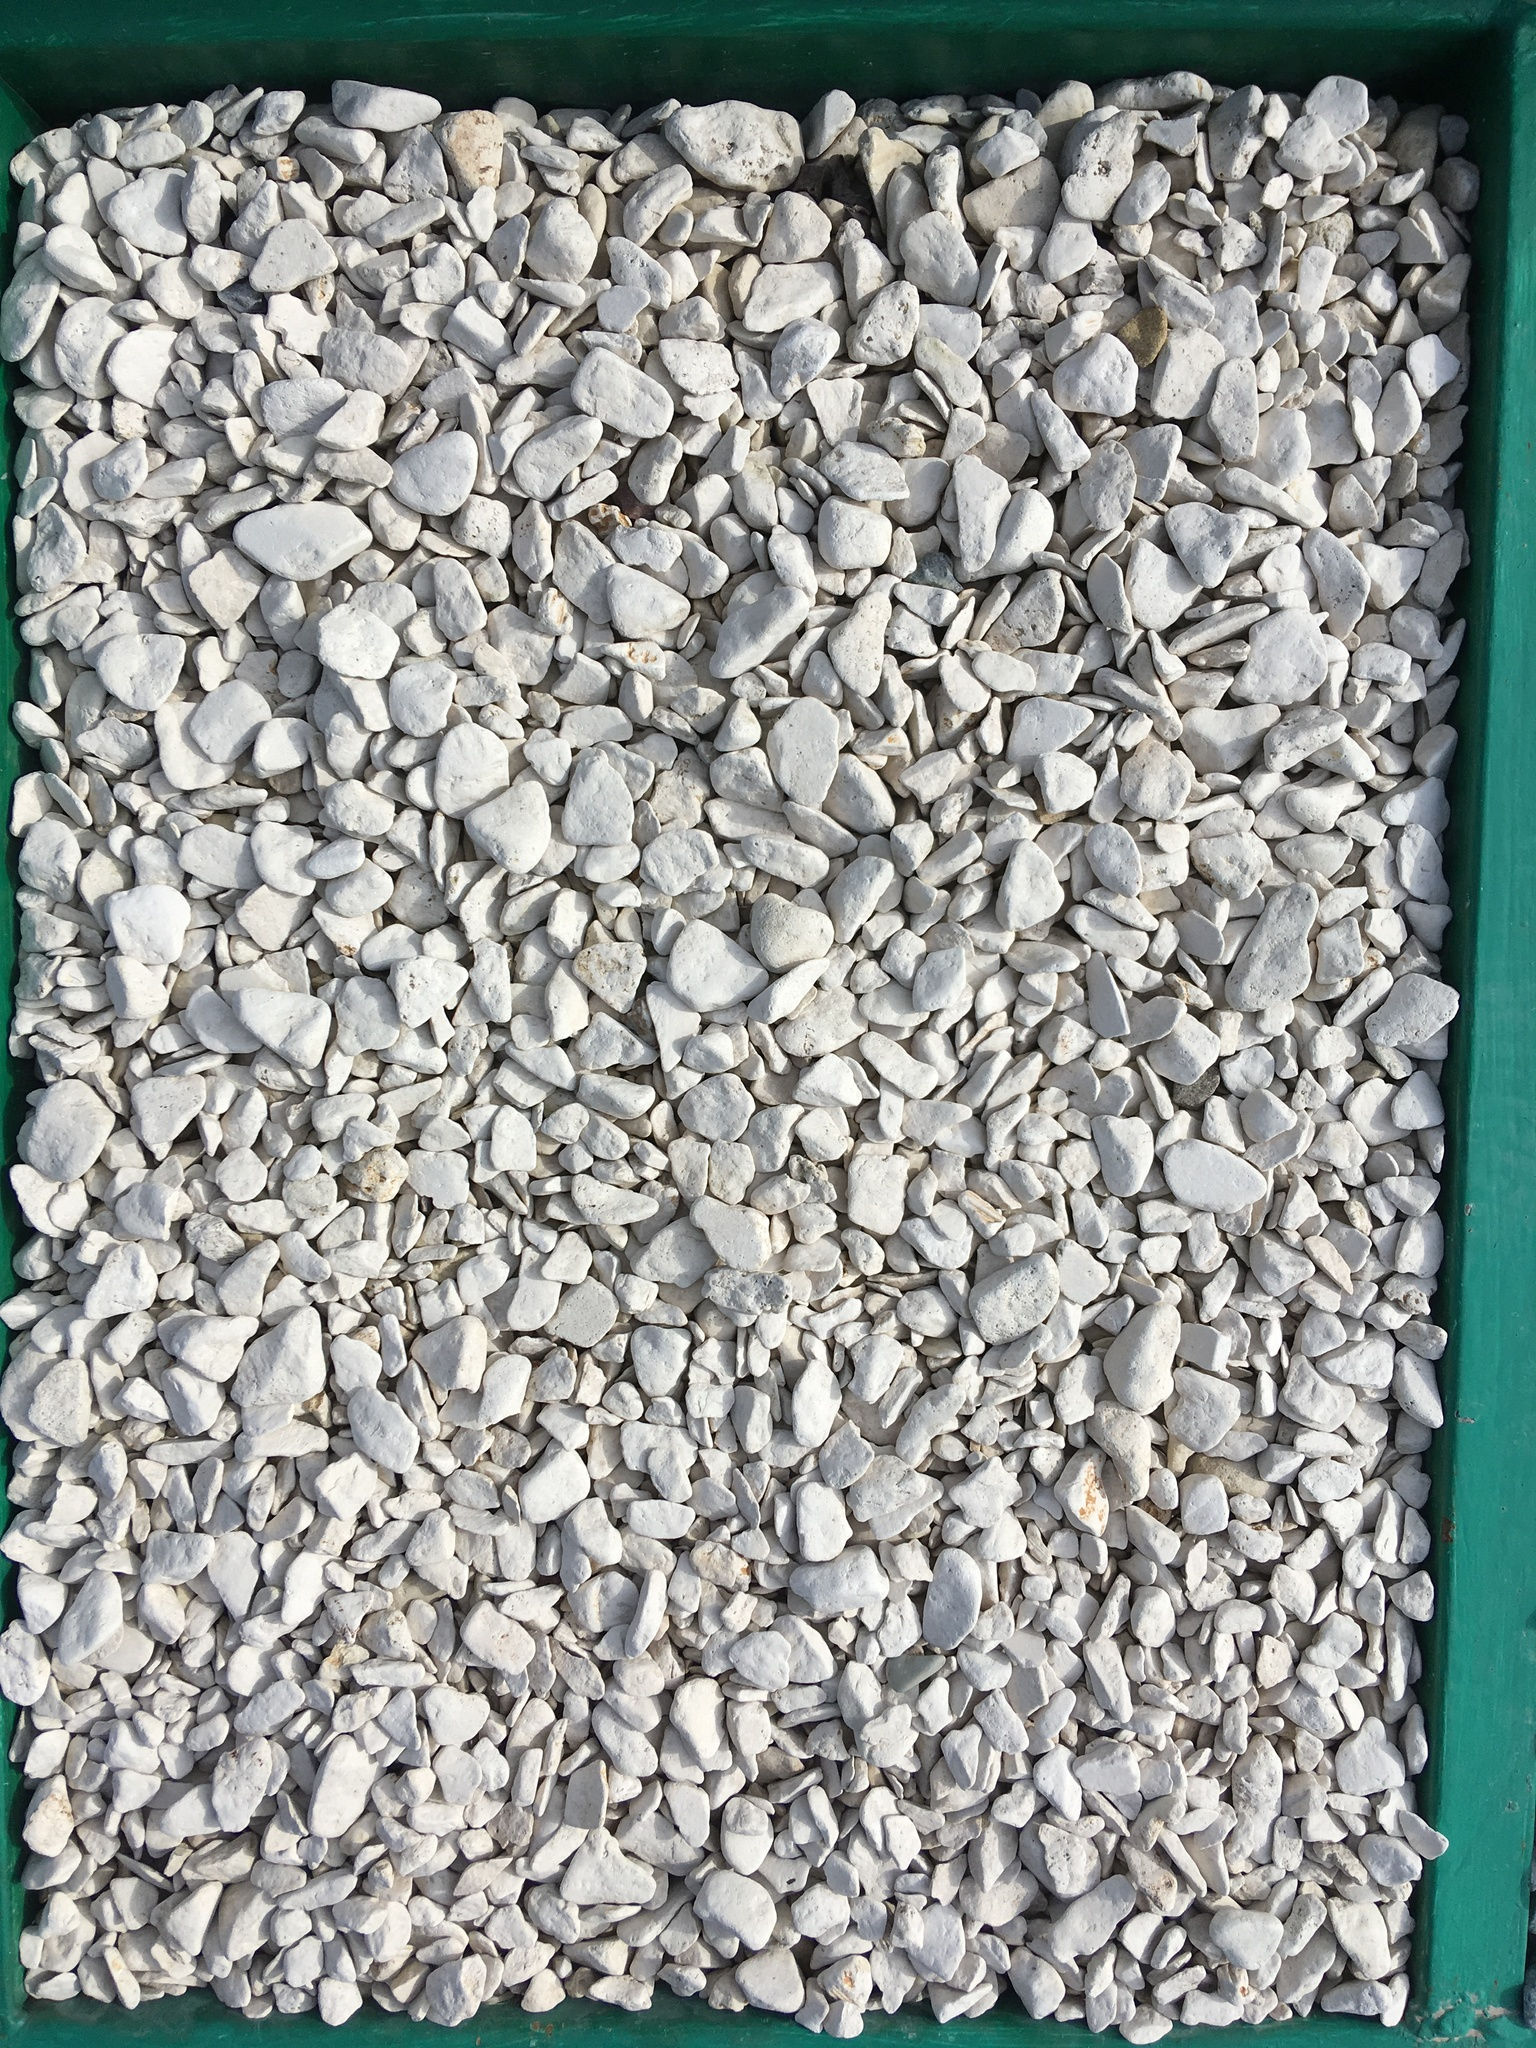 Галька декоративный щебень Бежевый 5-10 мм